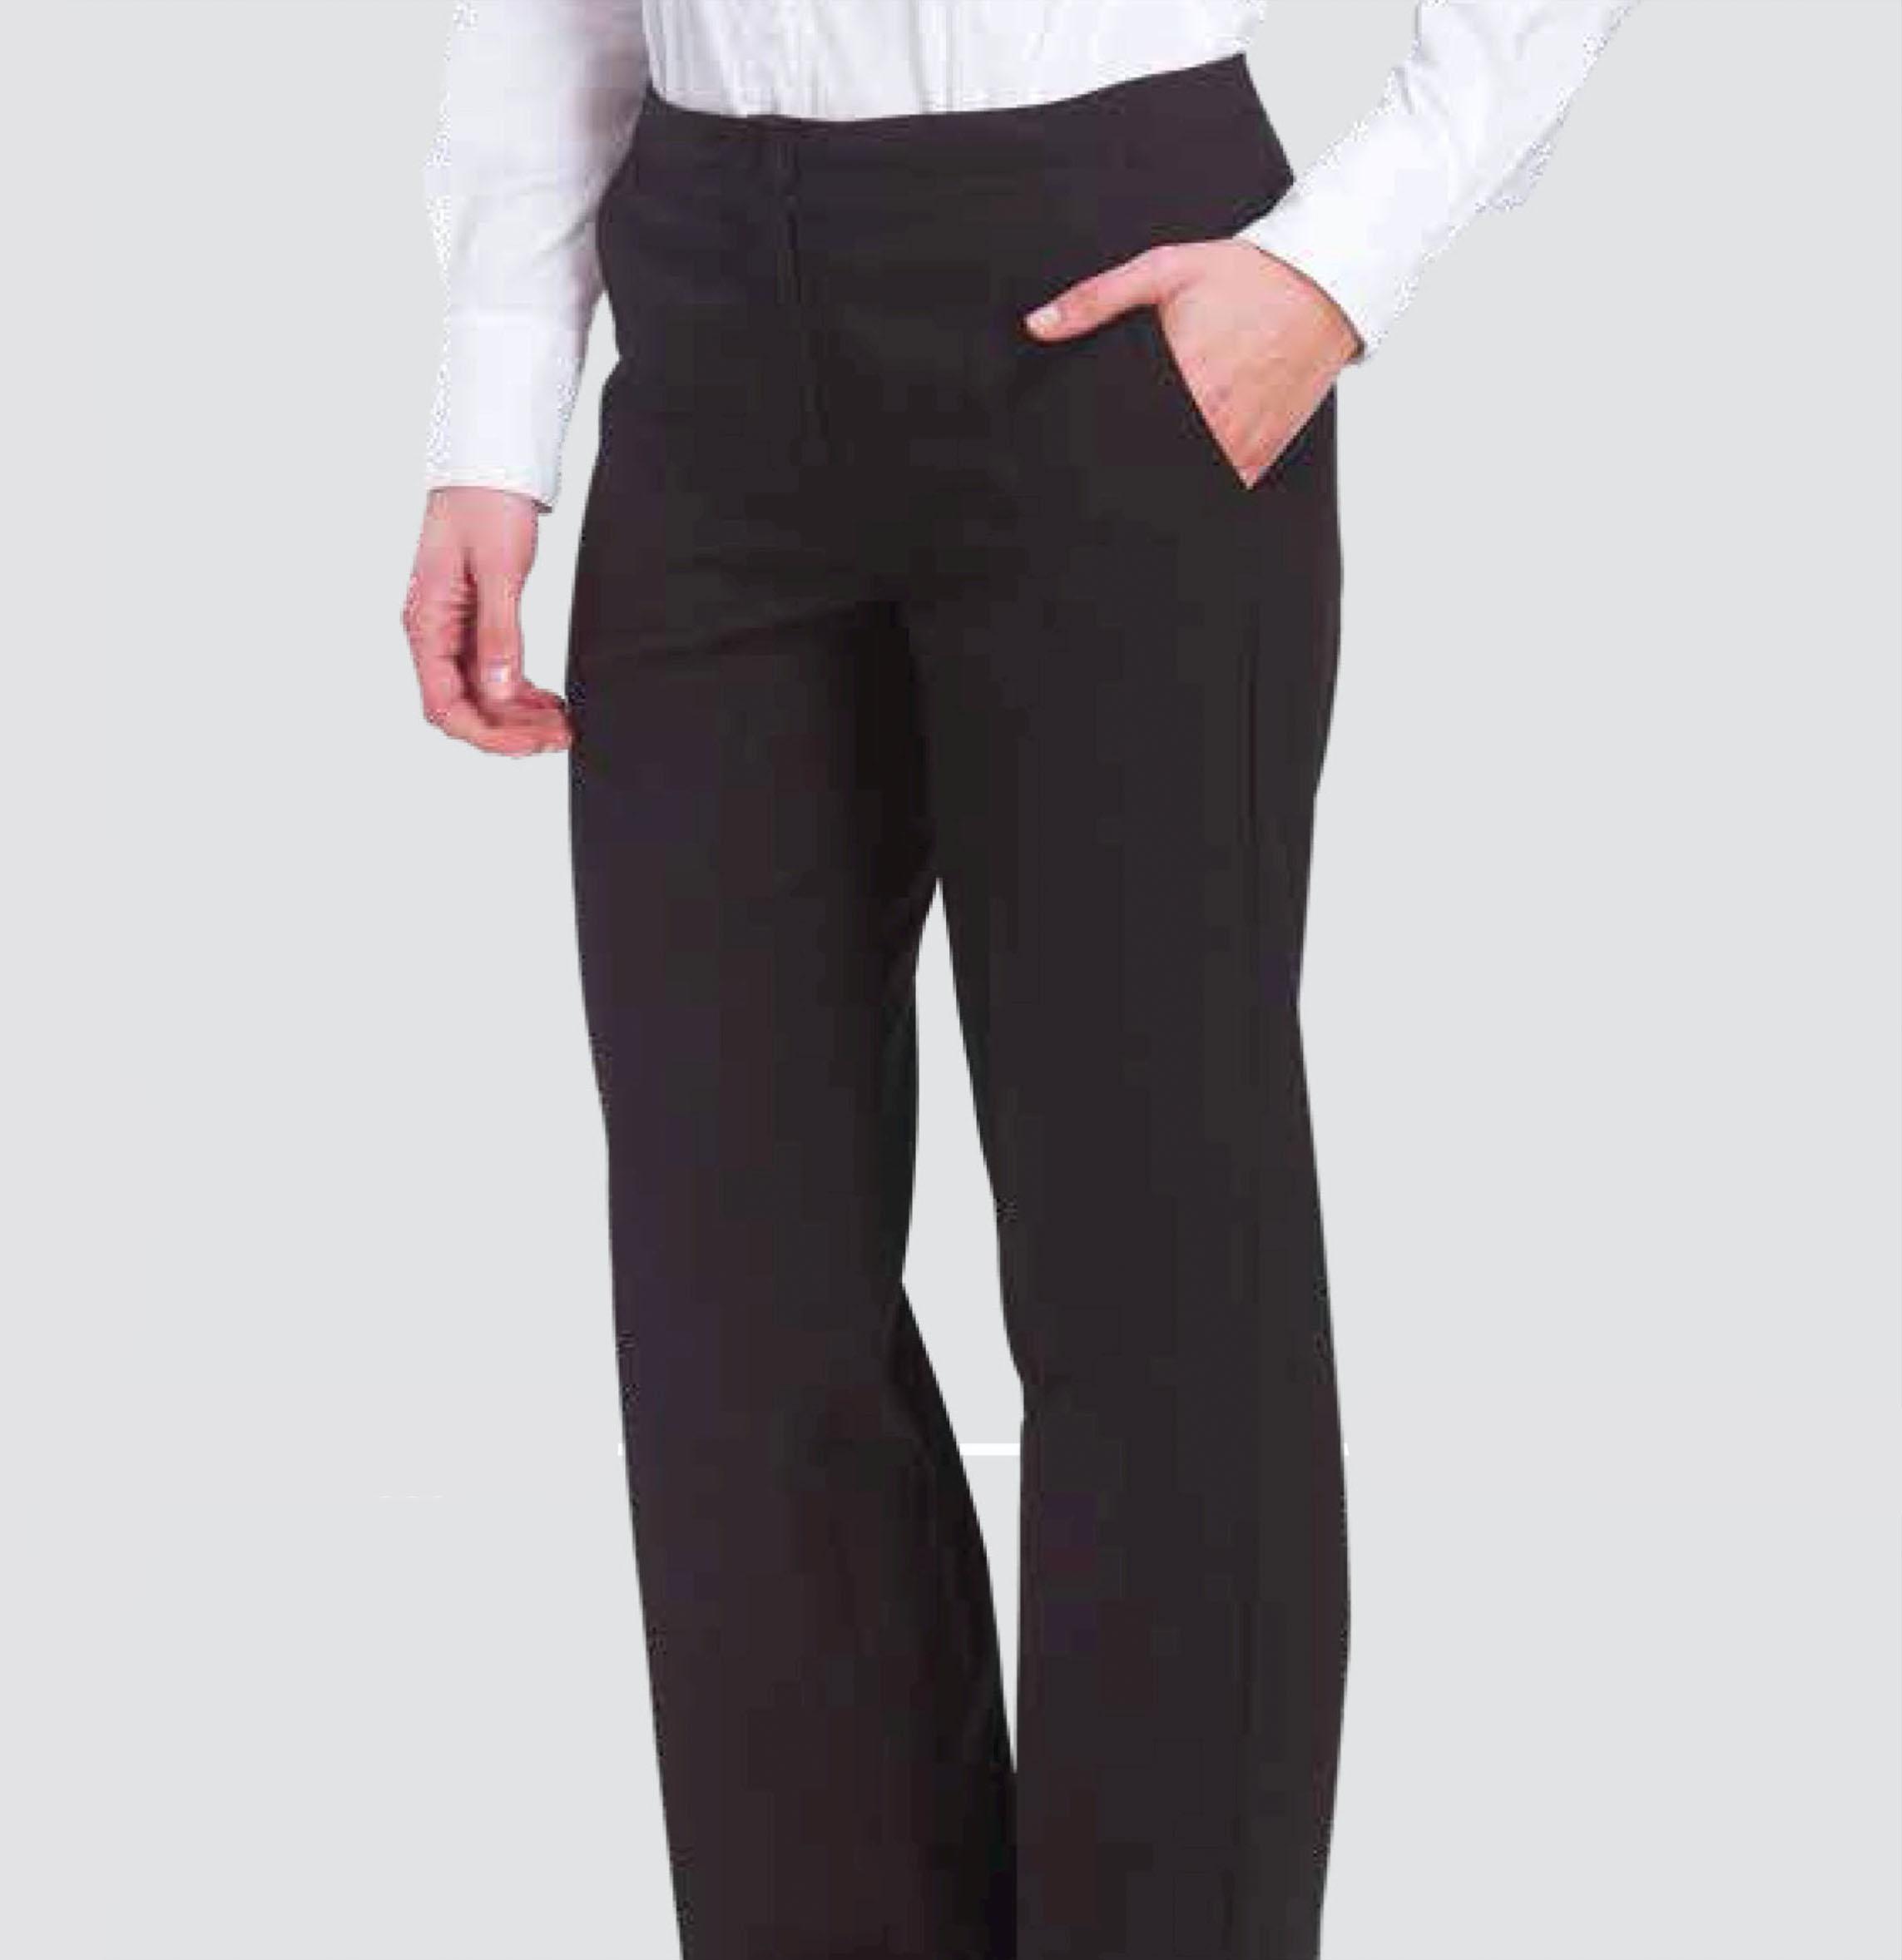 pantalone e gonna